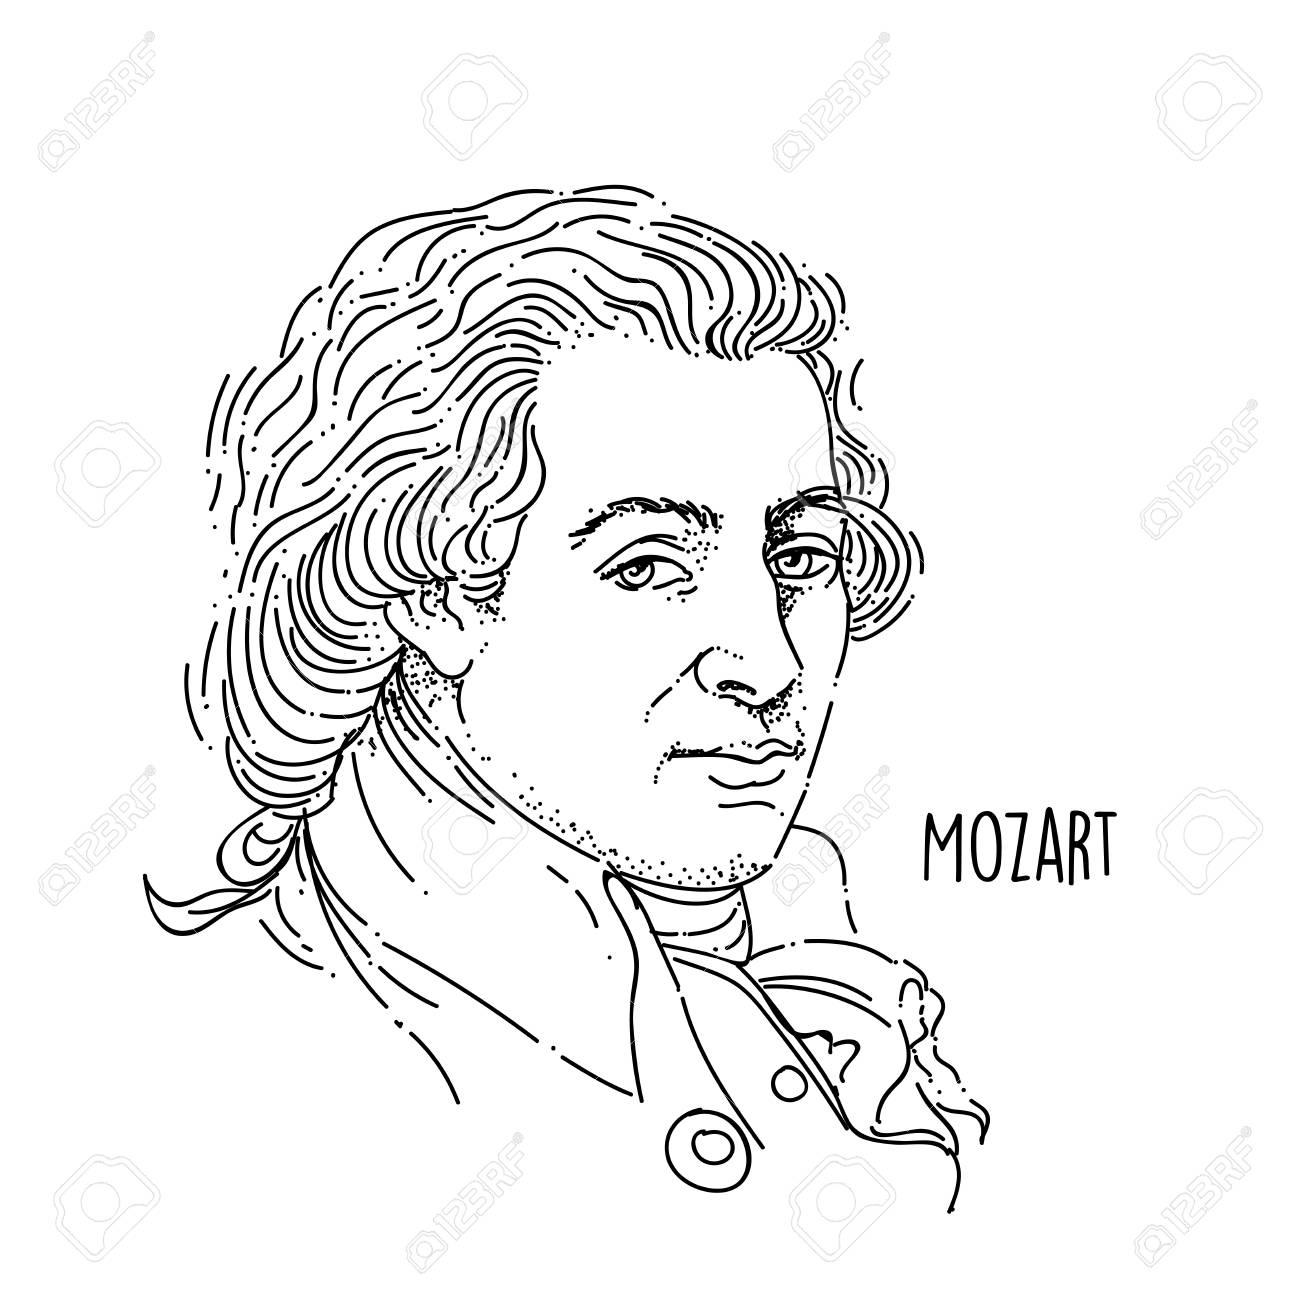 Wolfgang Amadeus Mozart Line Art Portrait - 104698656